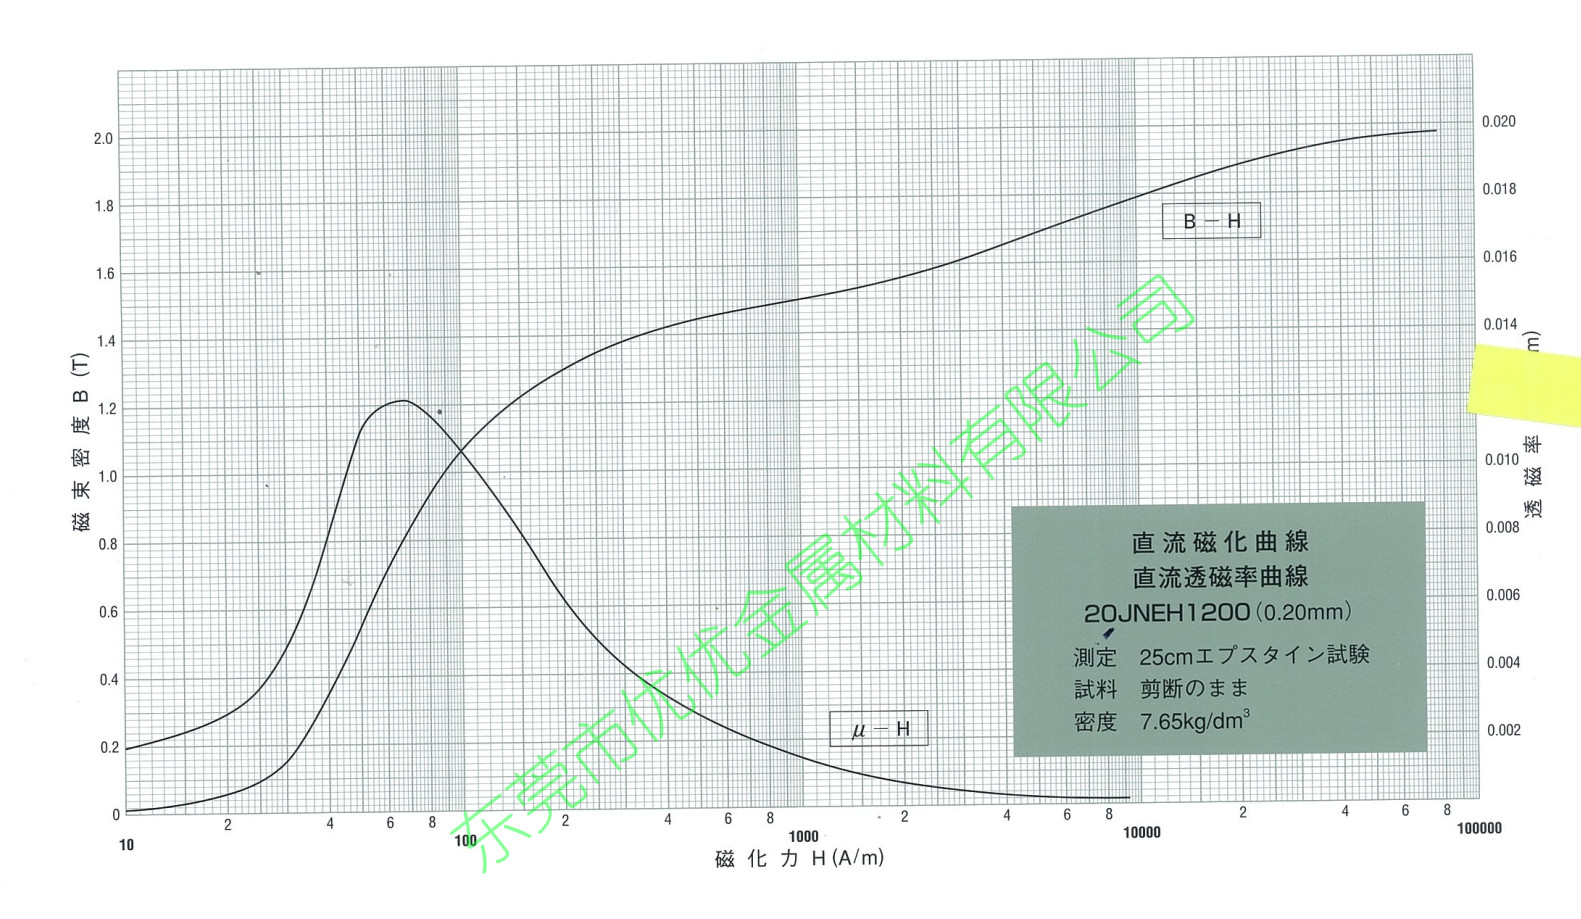 20JNEH1200磁化曲线B-H magnetizing curve